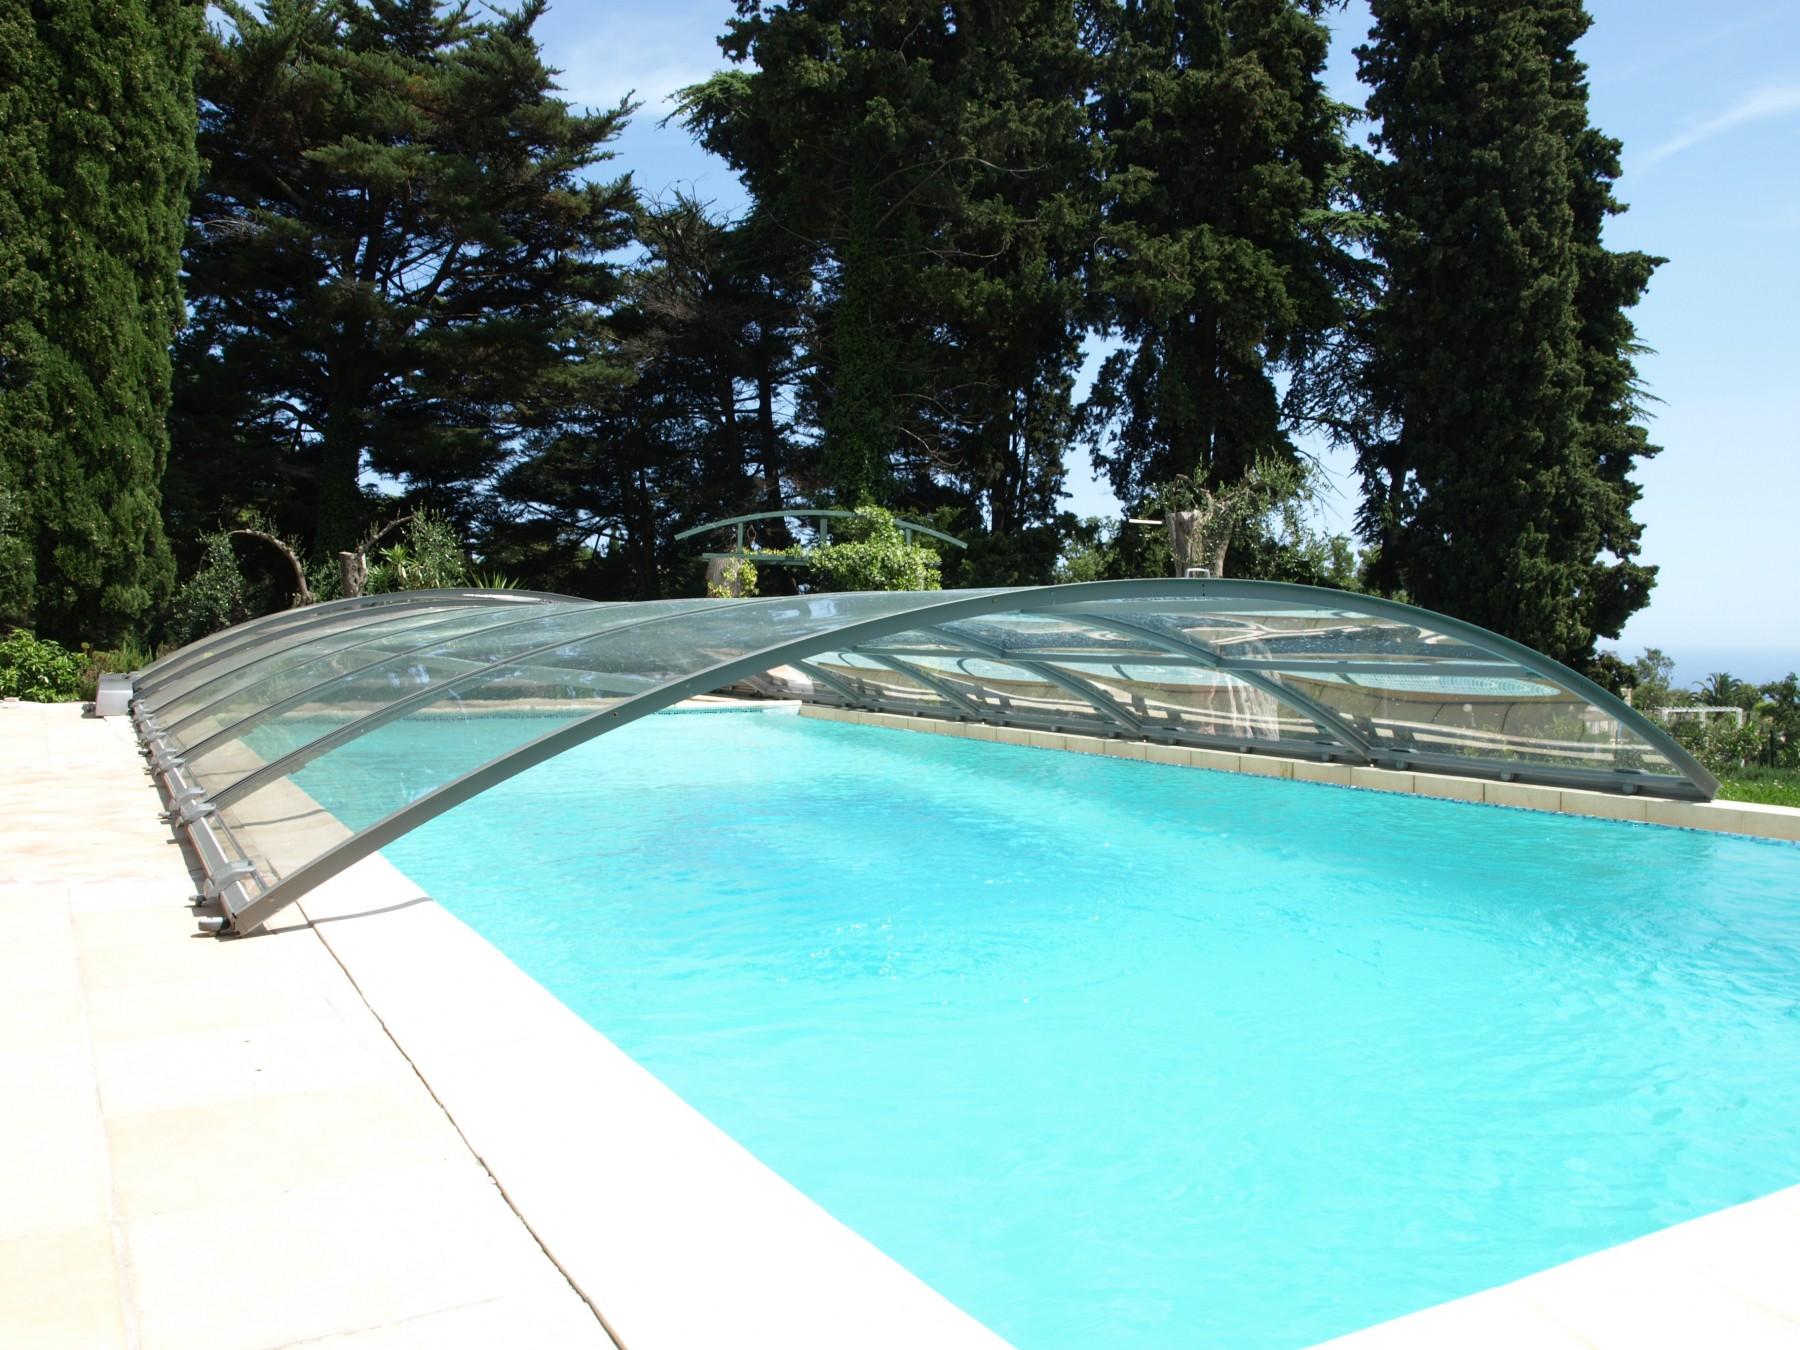 Cubierta de piscina motorizada abrisud piscinas ferromar for Piscinas ferromar